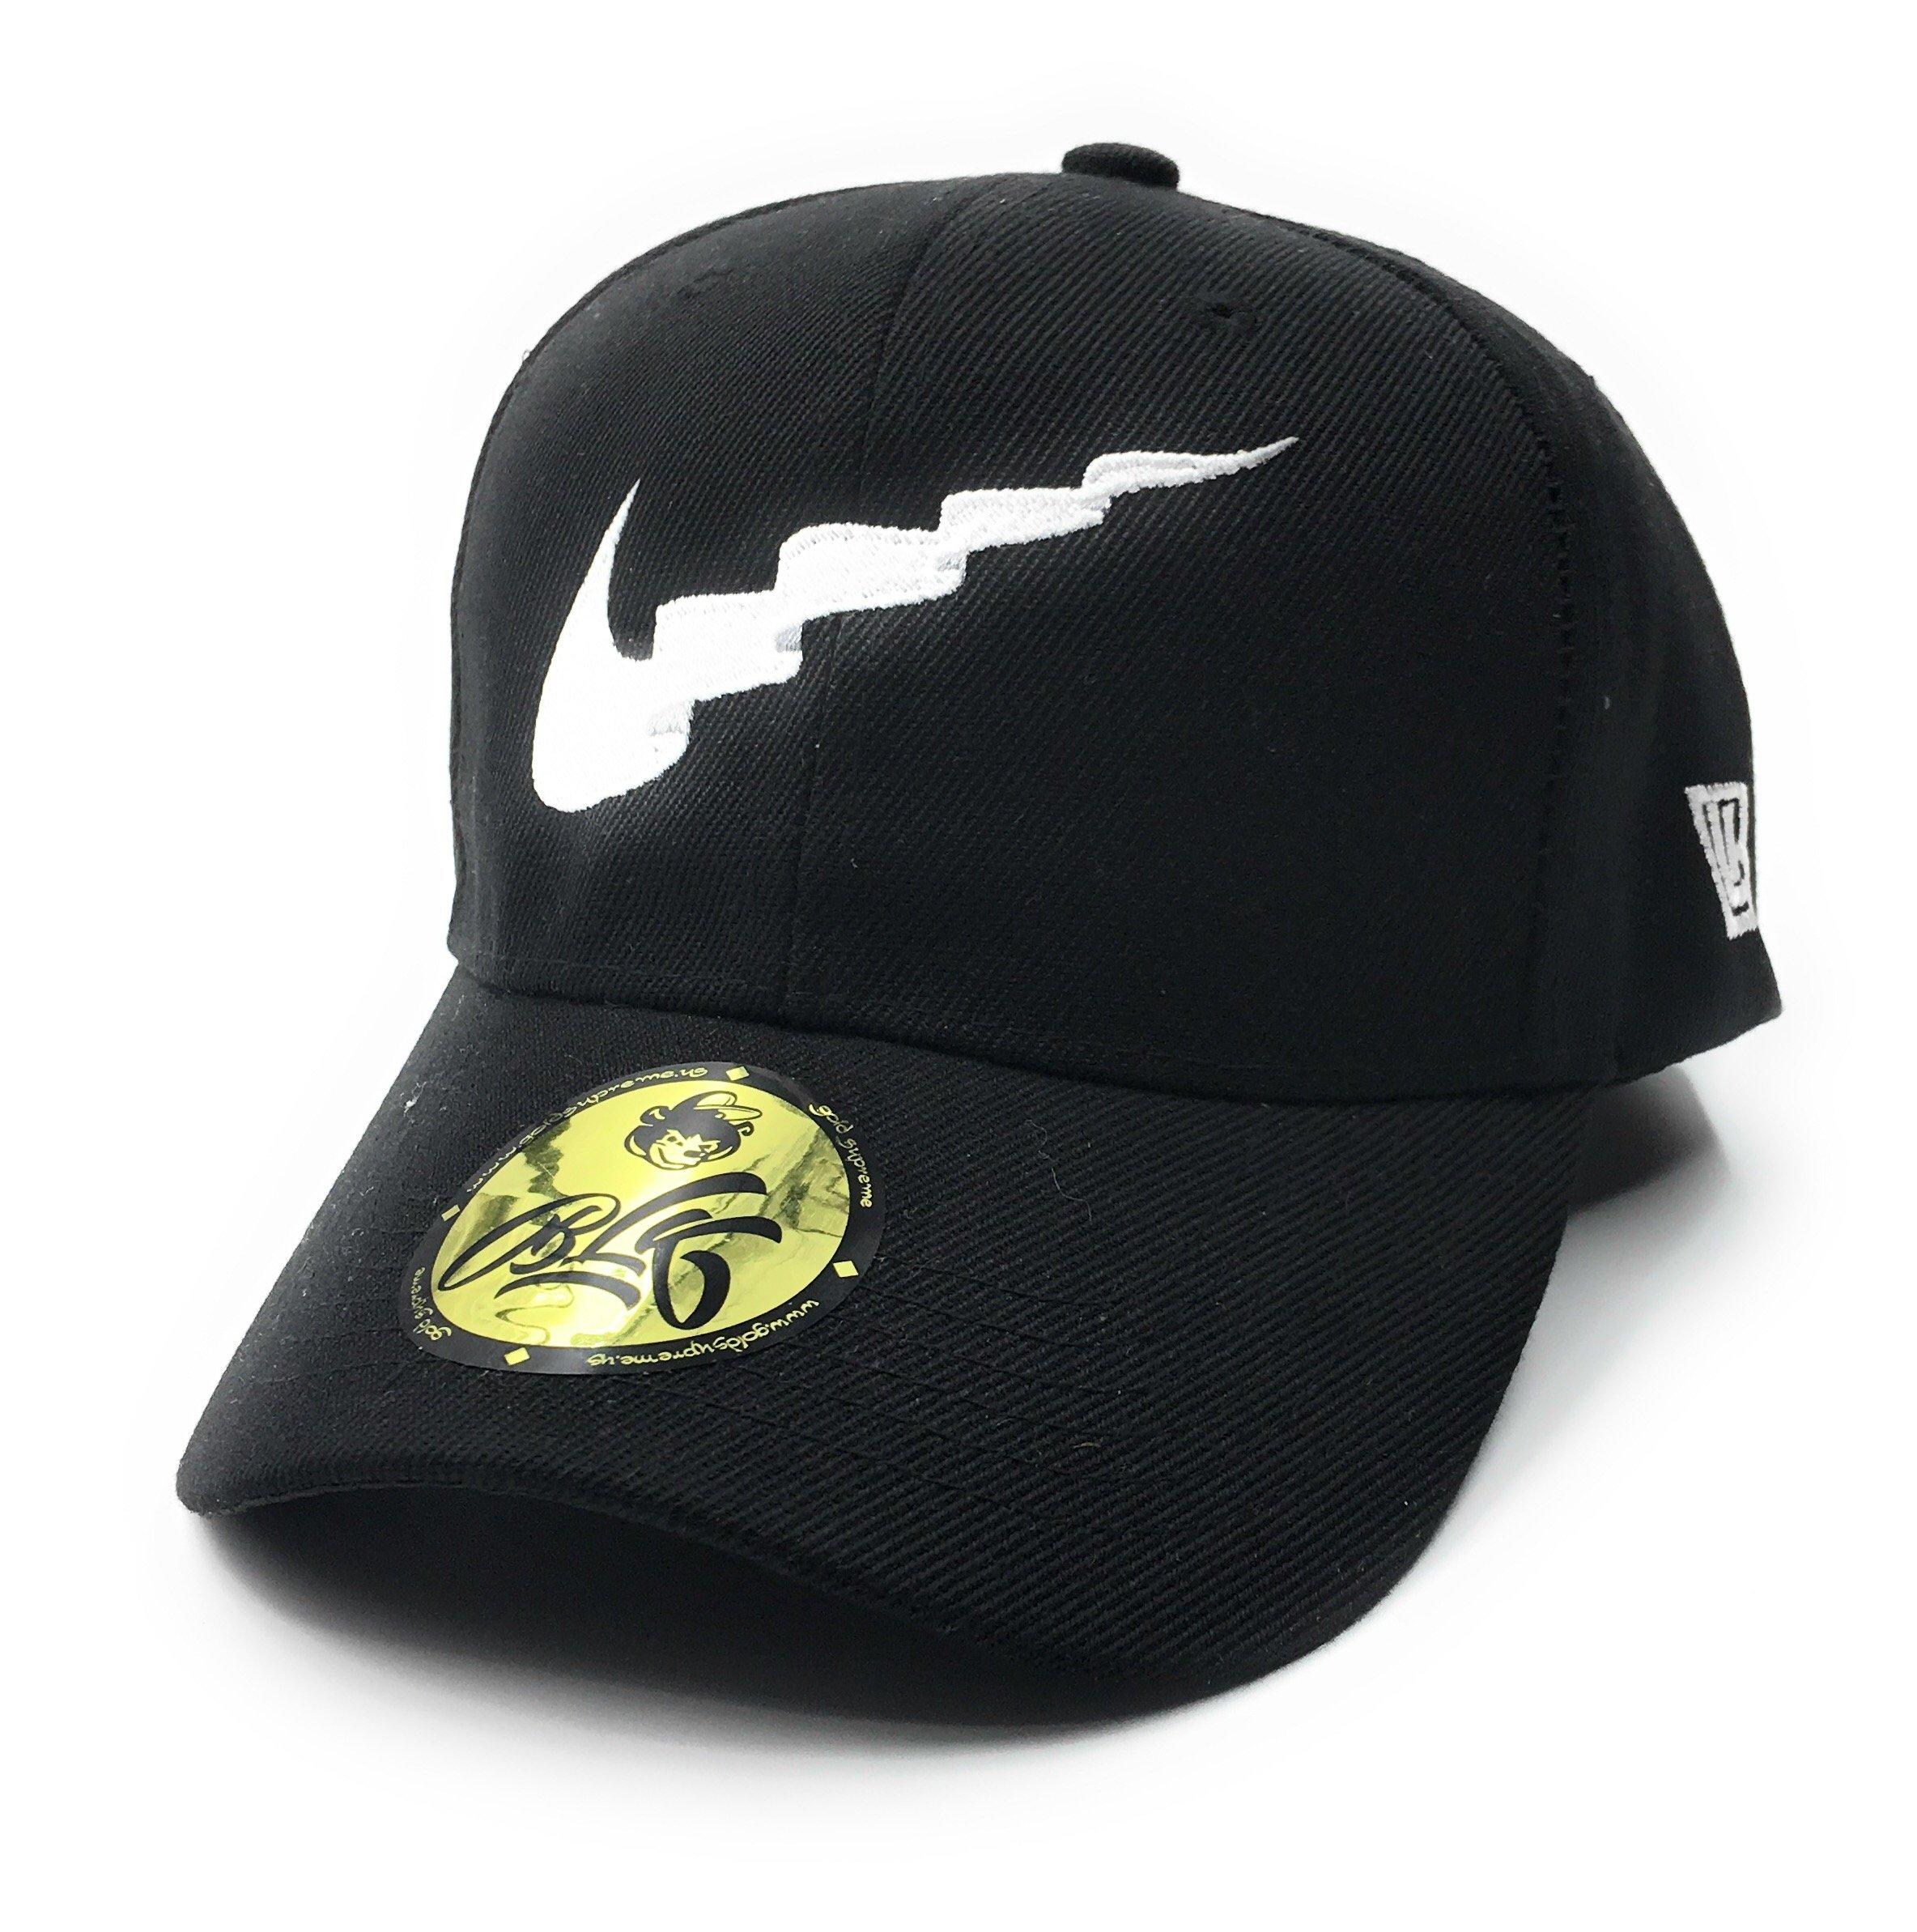 08bed08134e2c Galleon - B L K X Gold Supreme  Wavy Dad Hat - Black